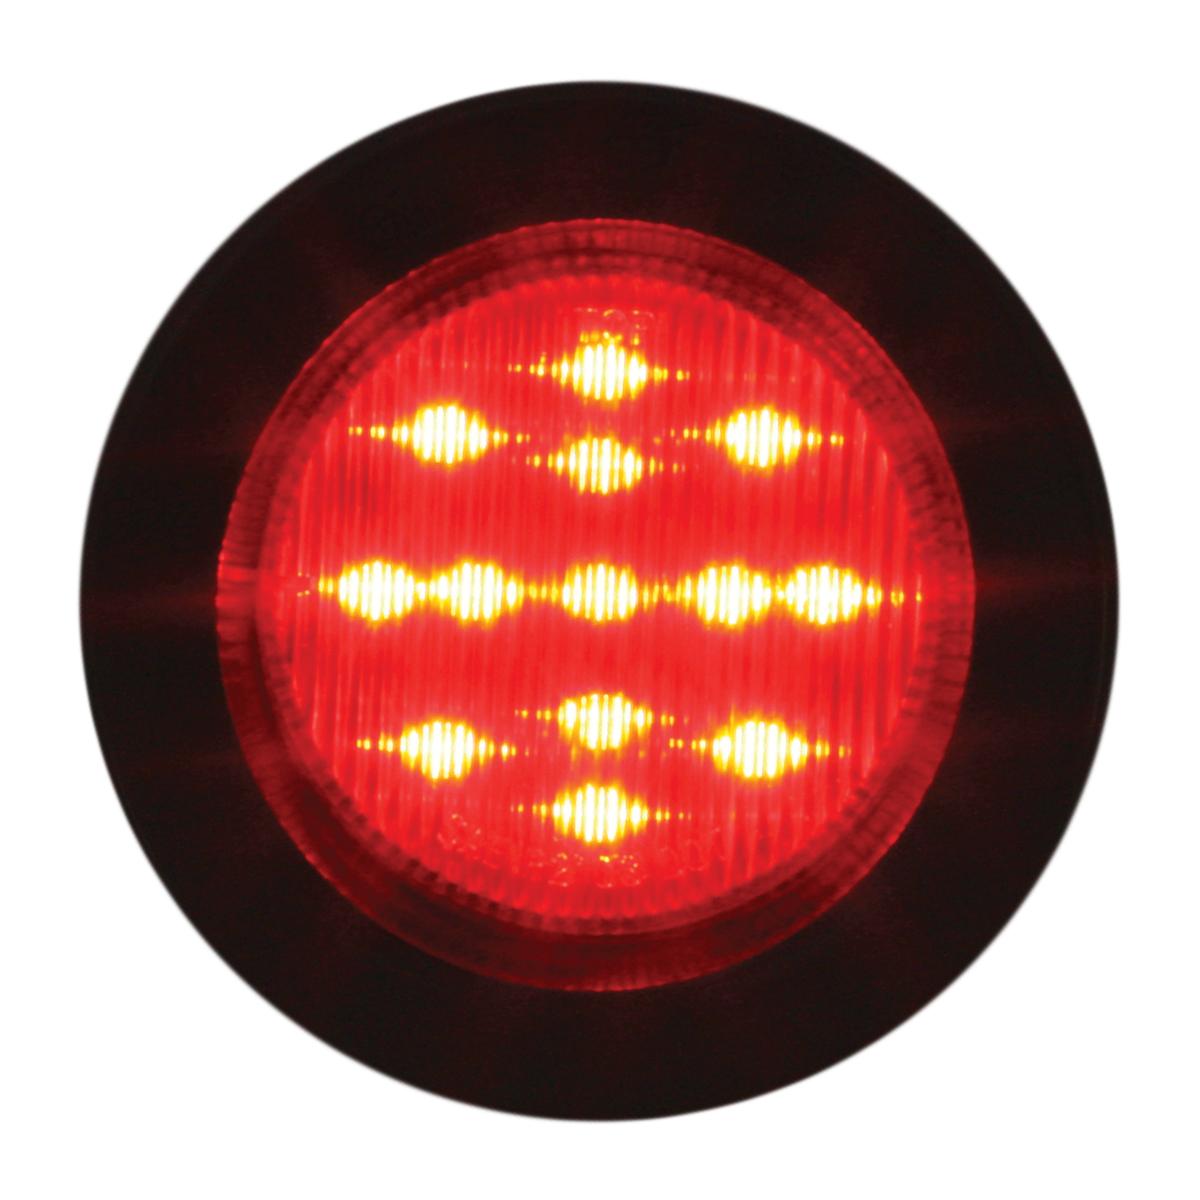 "79314 2-1/2"" Round Fleet Marker Light w/ Grommet"